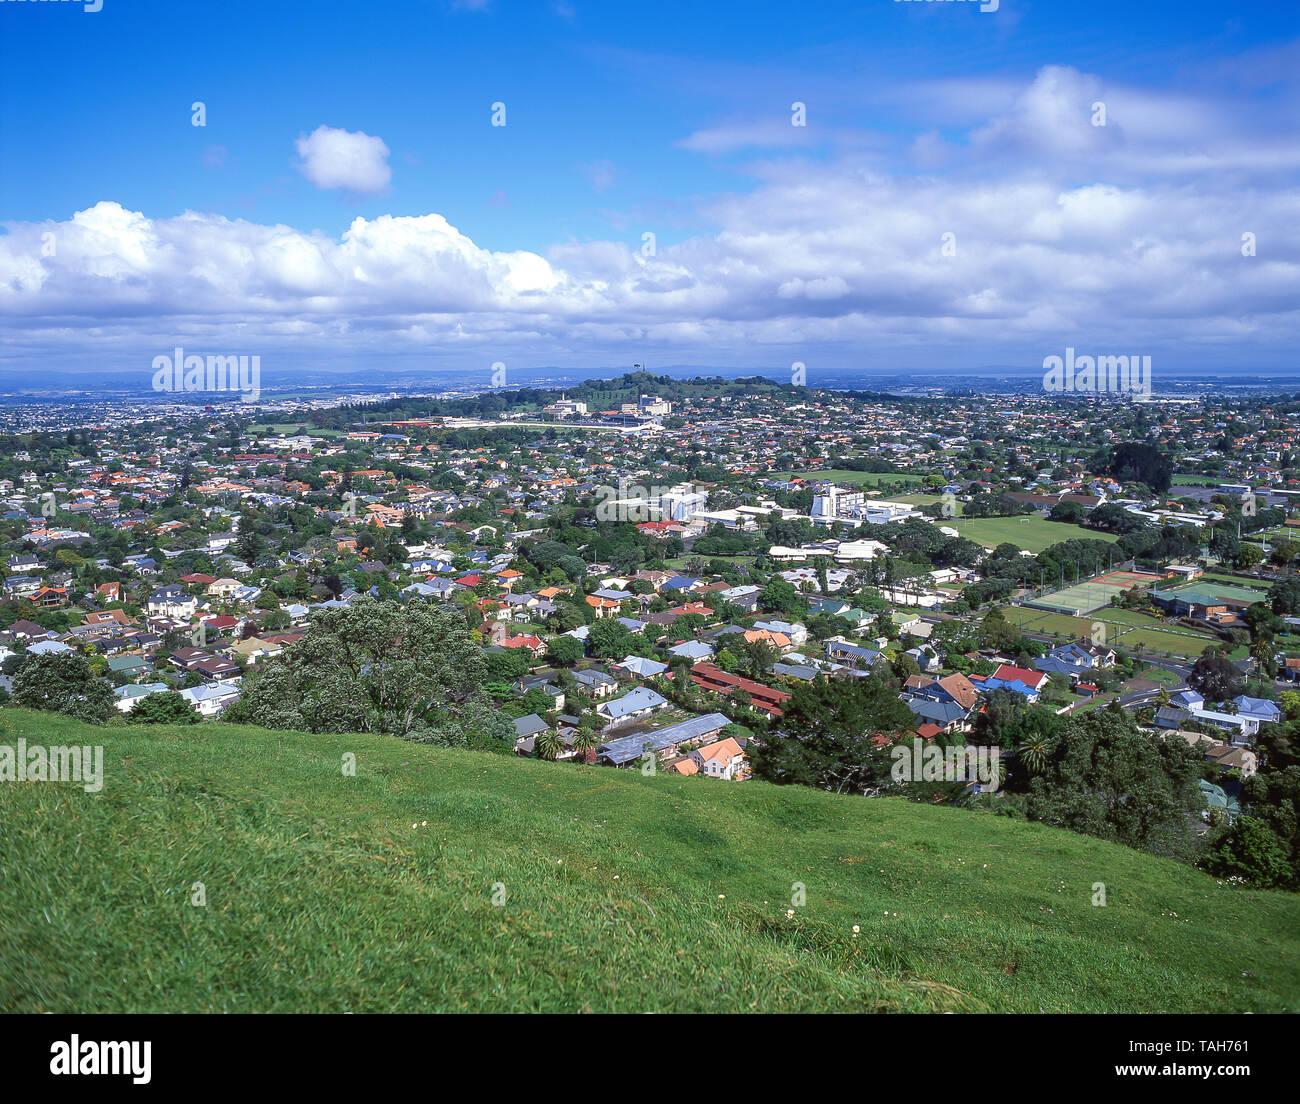 Epsom suburb from Mt Eden Summit (Maungawhau), Auckland, Auckland Region, New Zealand - Stock Image